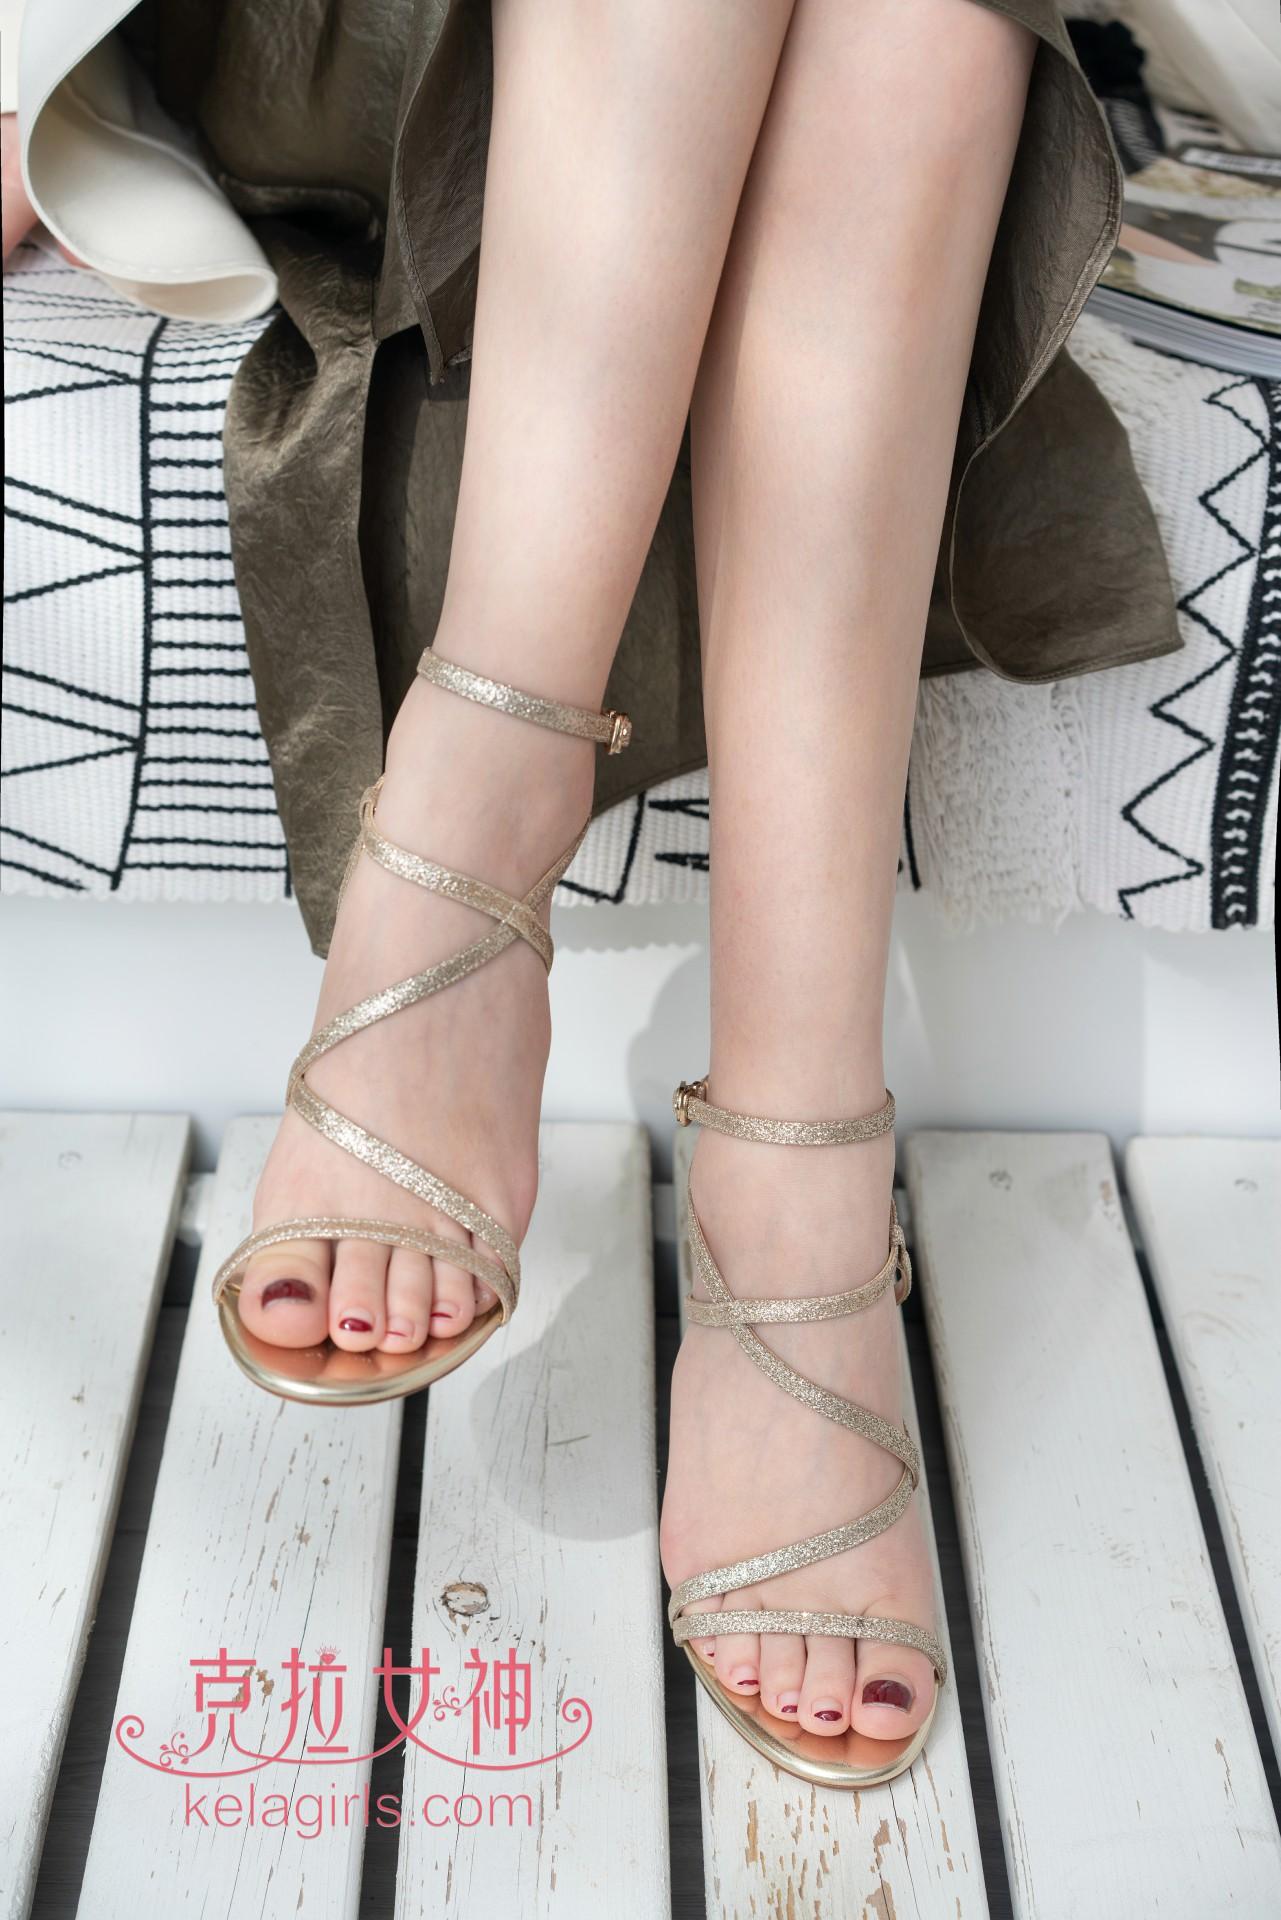 [KeLaGirls克拉女神] 2020.05.20《小脚与西服》小芙